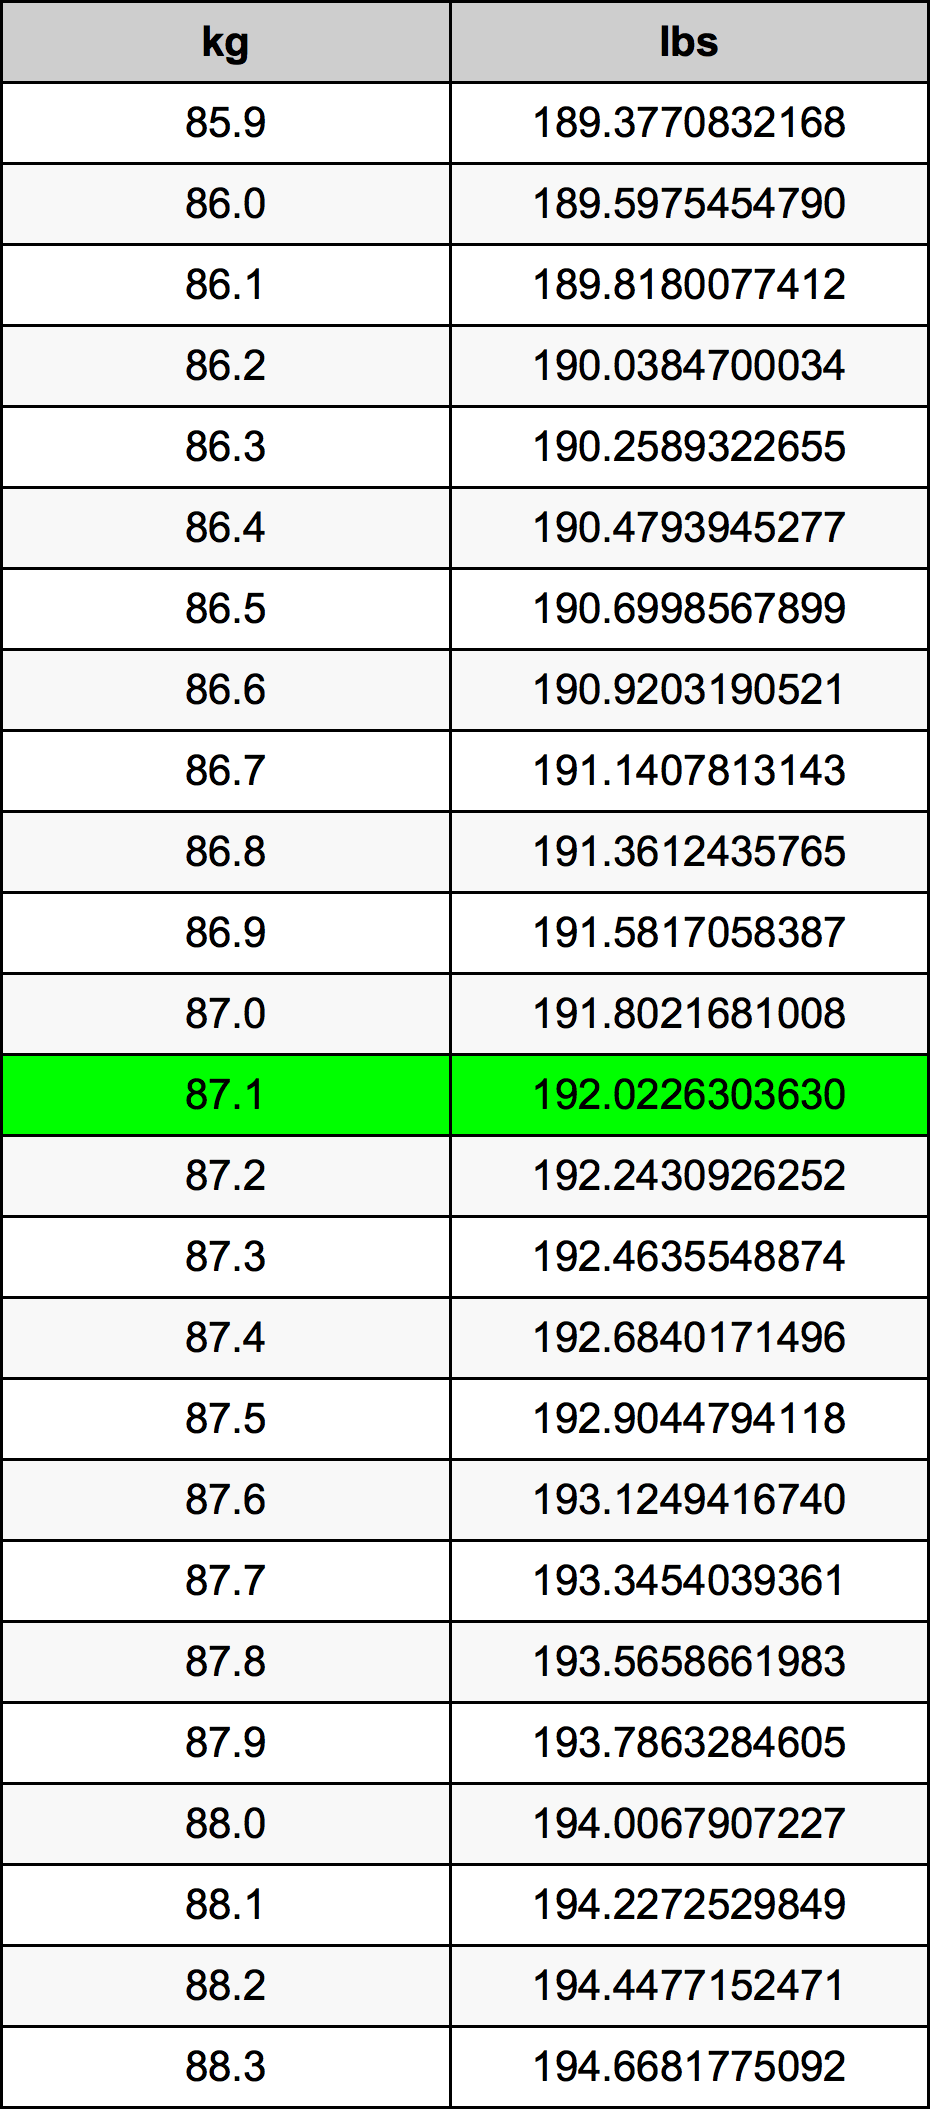 87.1 Kilogramme Table